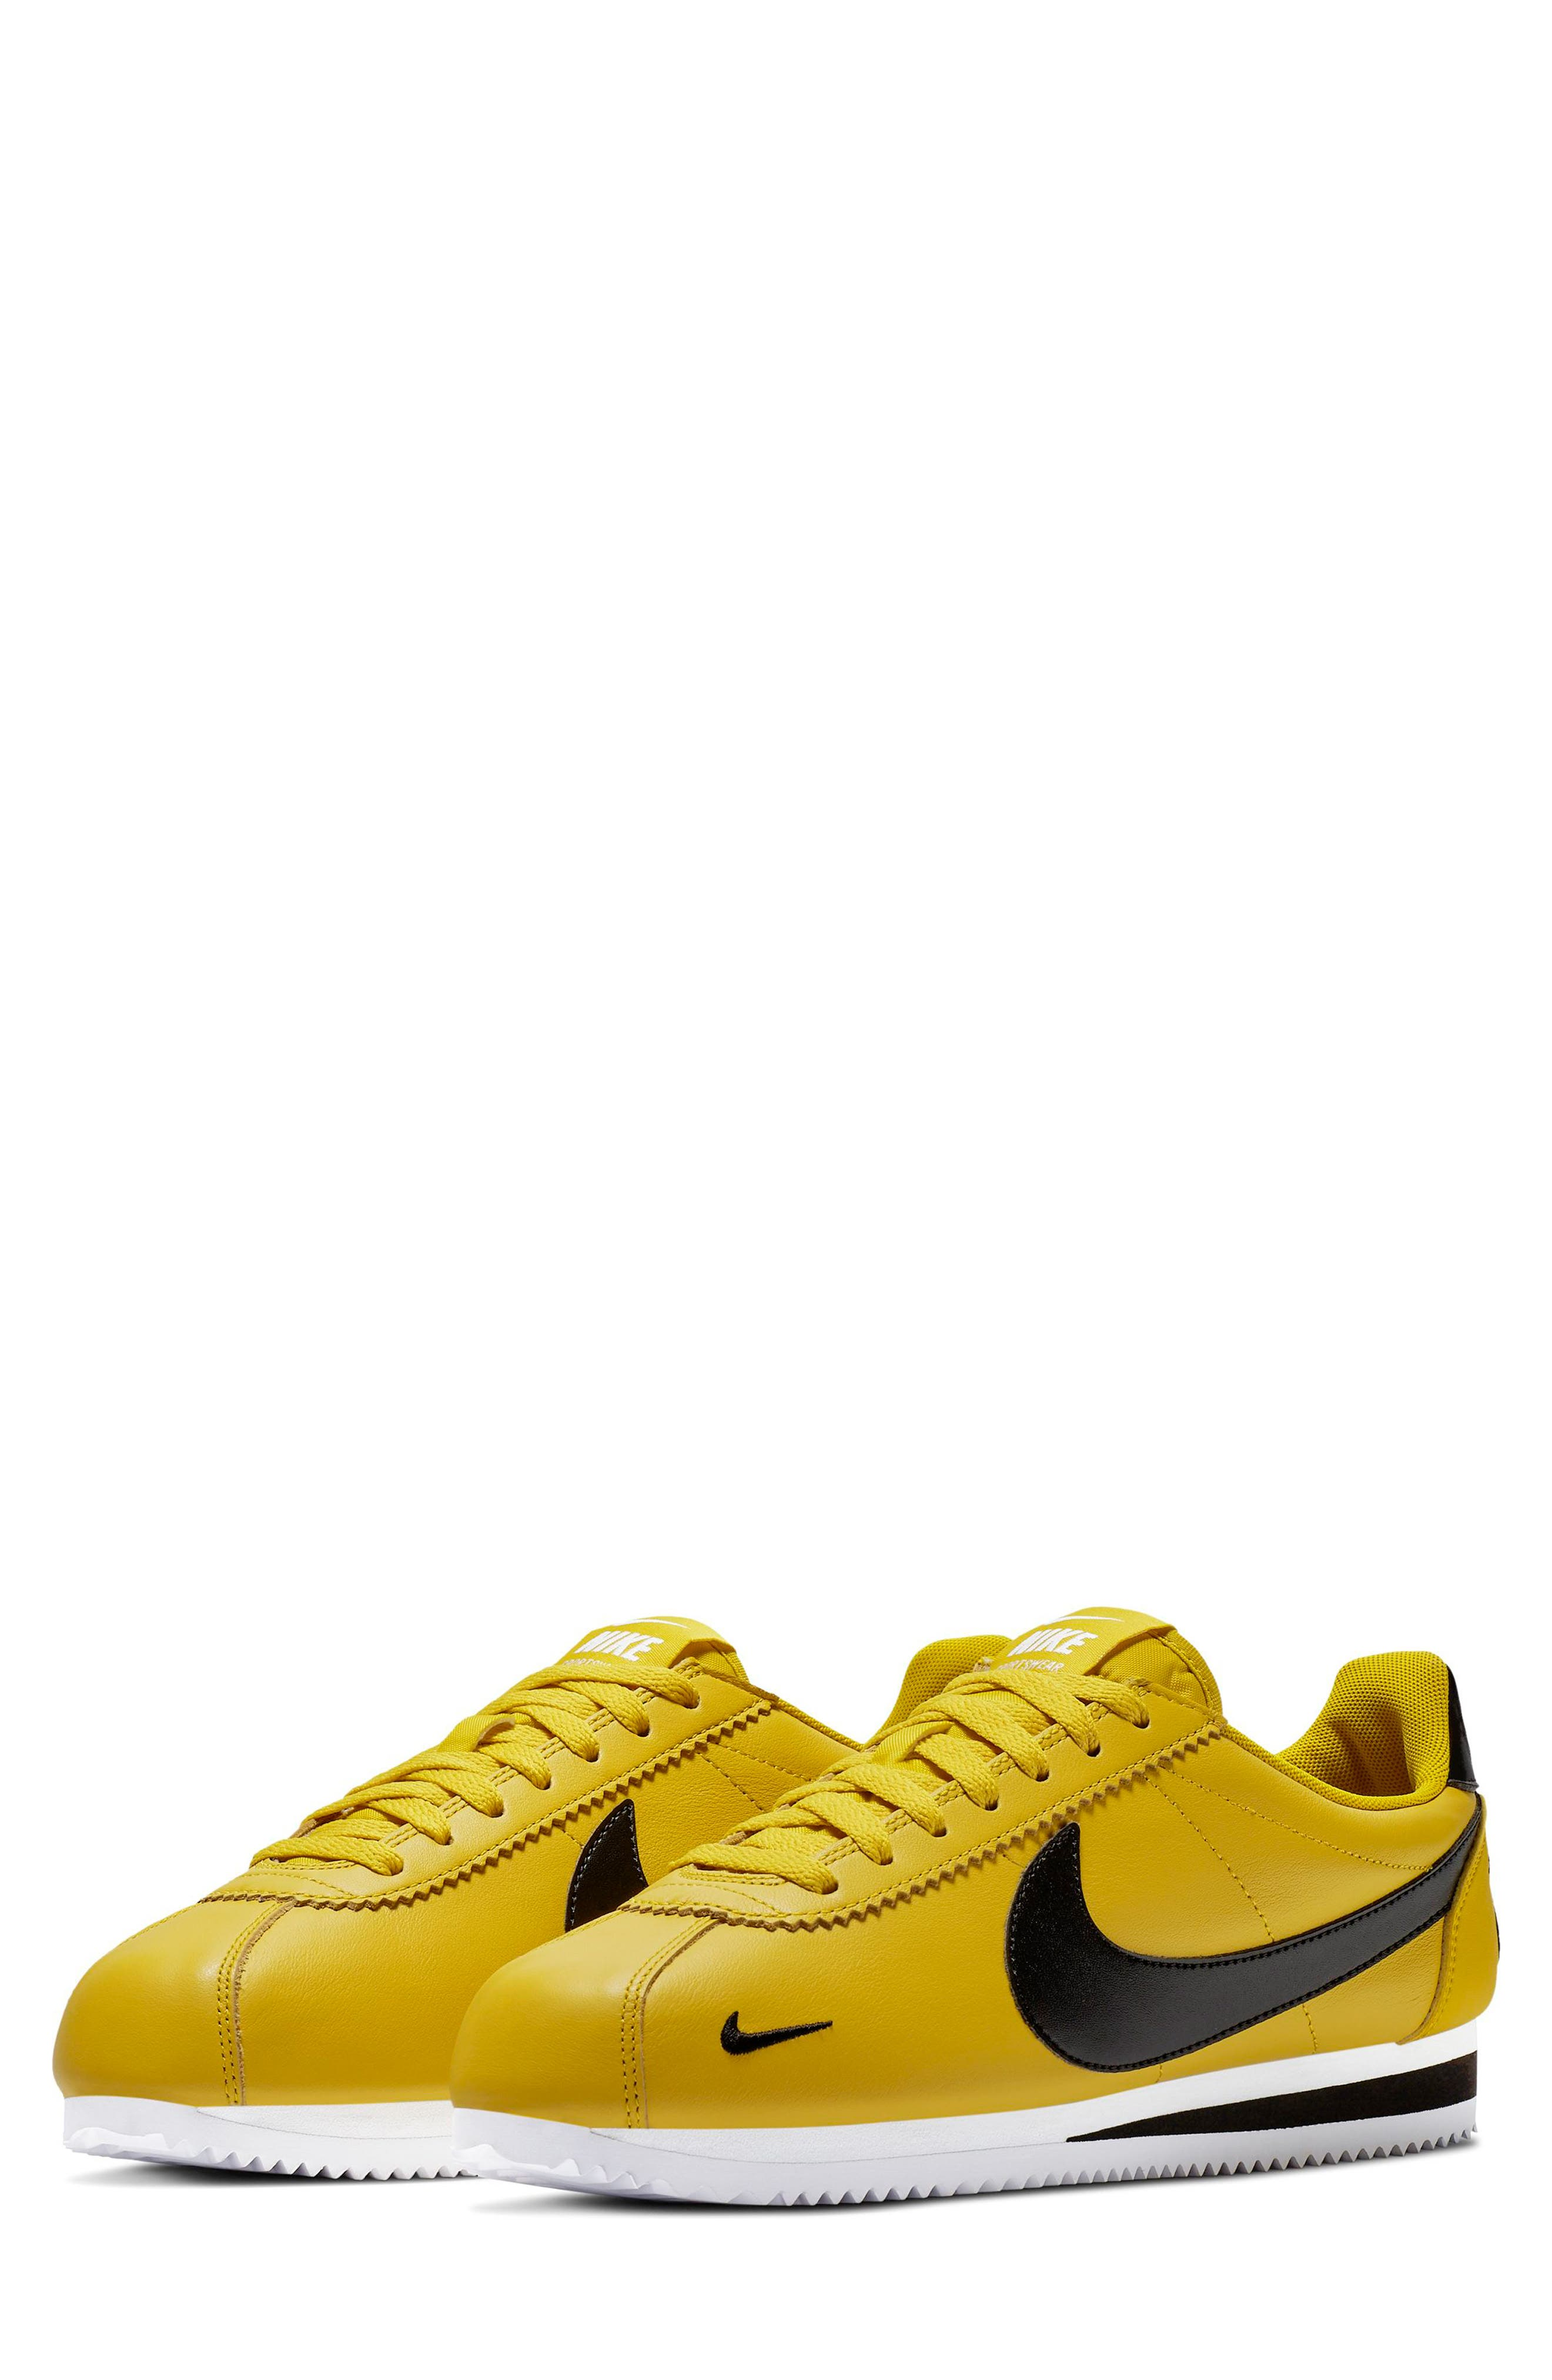 NIKE, Classic Cortez Premium Sneaker, Main thumbnail 1, color, BRIGHT CITRON/ BLACK/ WHITE